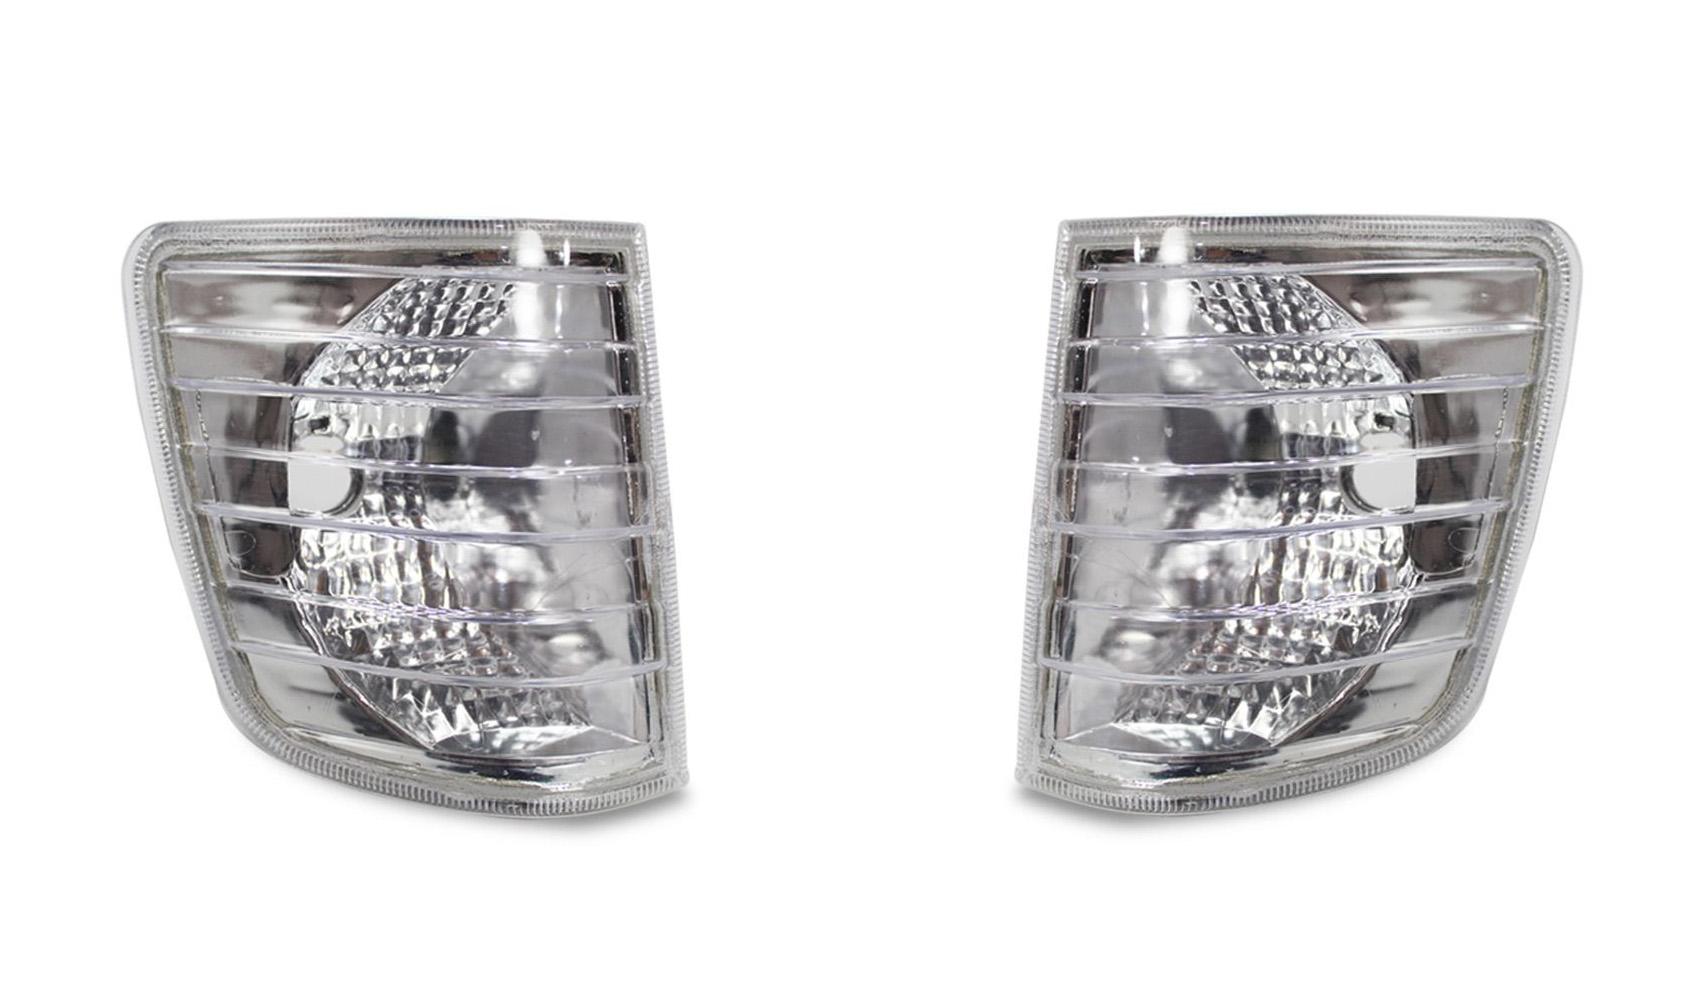 Lanterna Seta Mb 1214 1418 1618 1620 1630 1634 1935 1938 1941 Bicudo - Esportiva Cristal (Par)